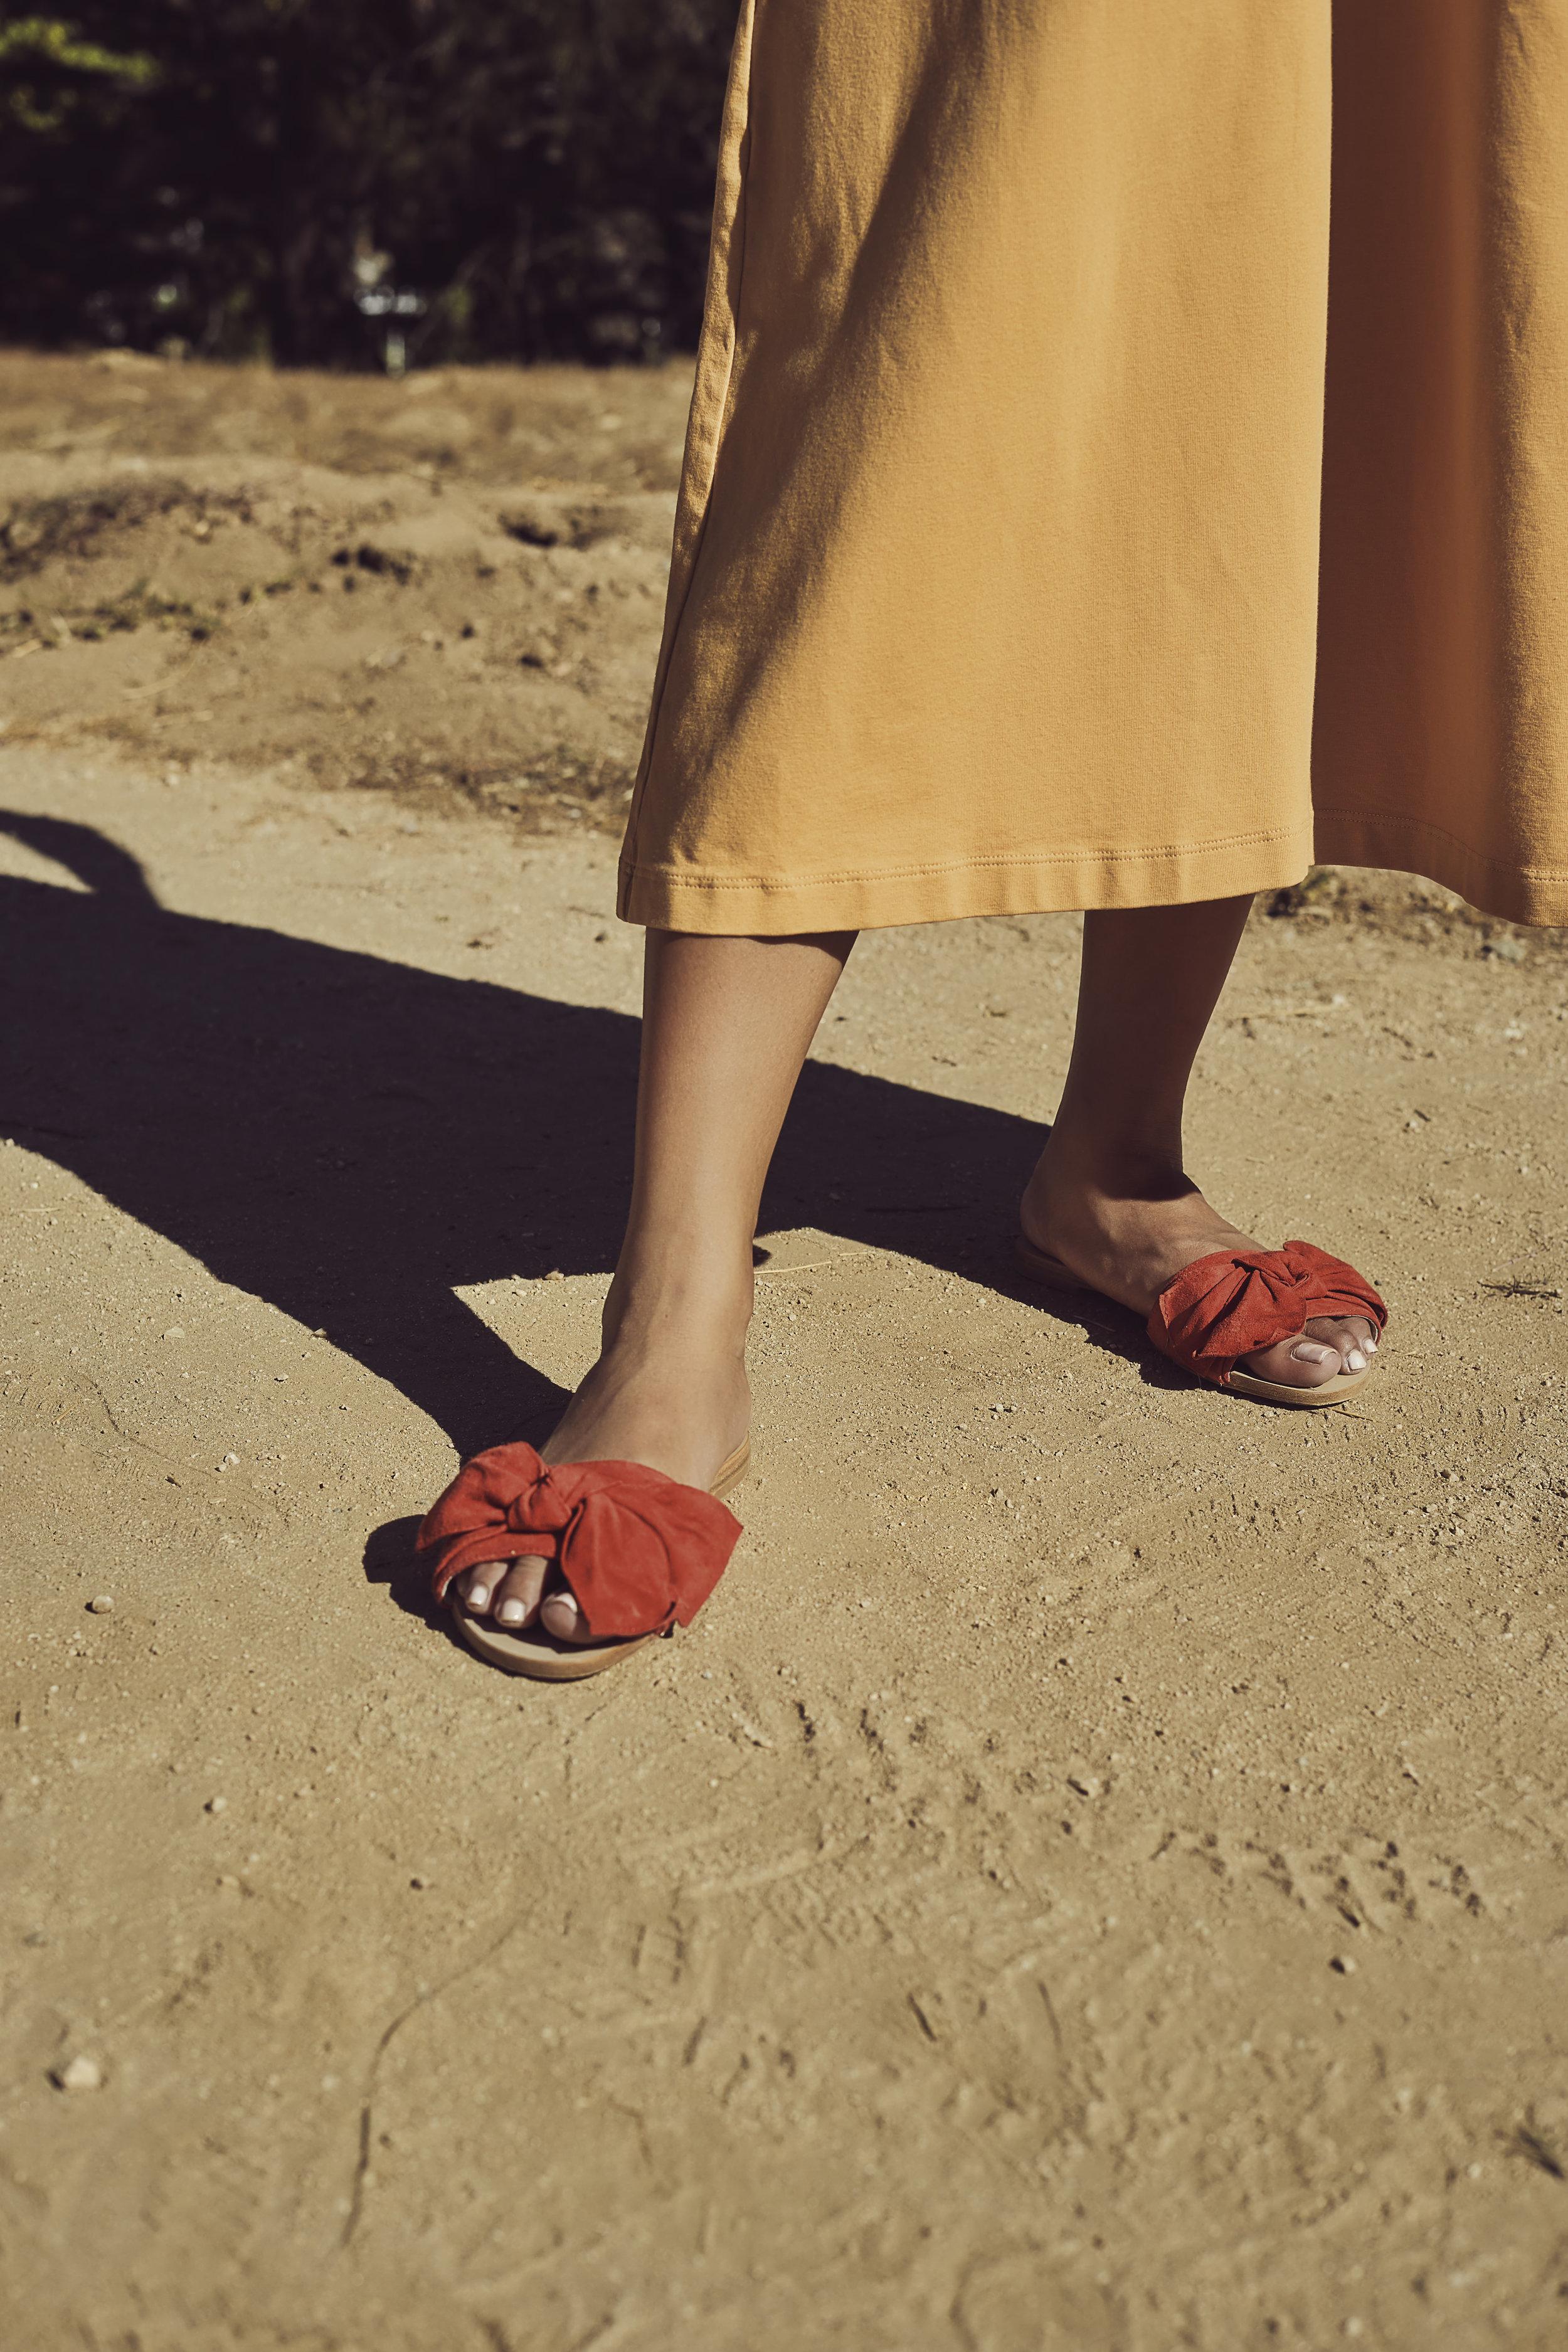 mien jumpsuit  |  crap eyewear shades  |  raye sandals  |  photos by sean martin